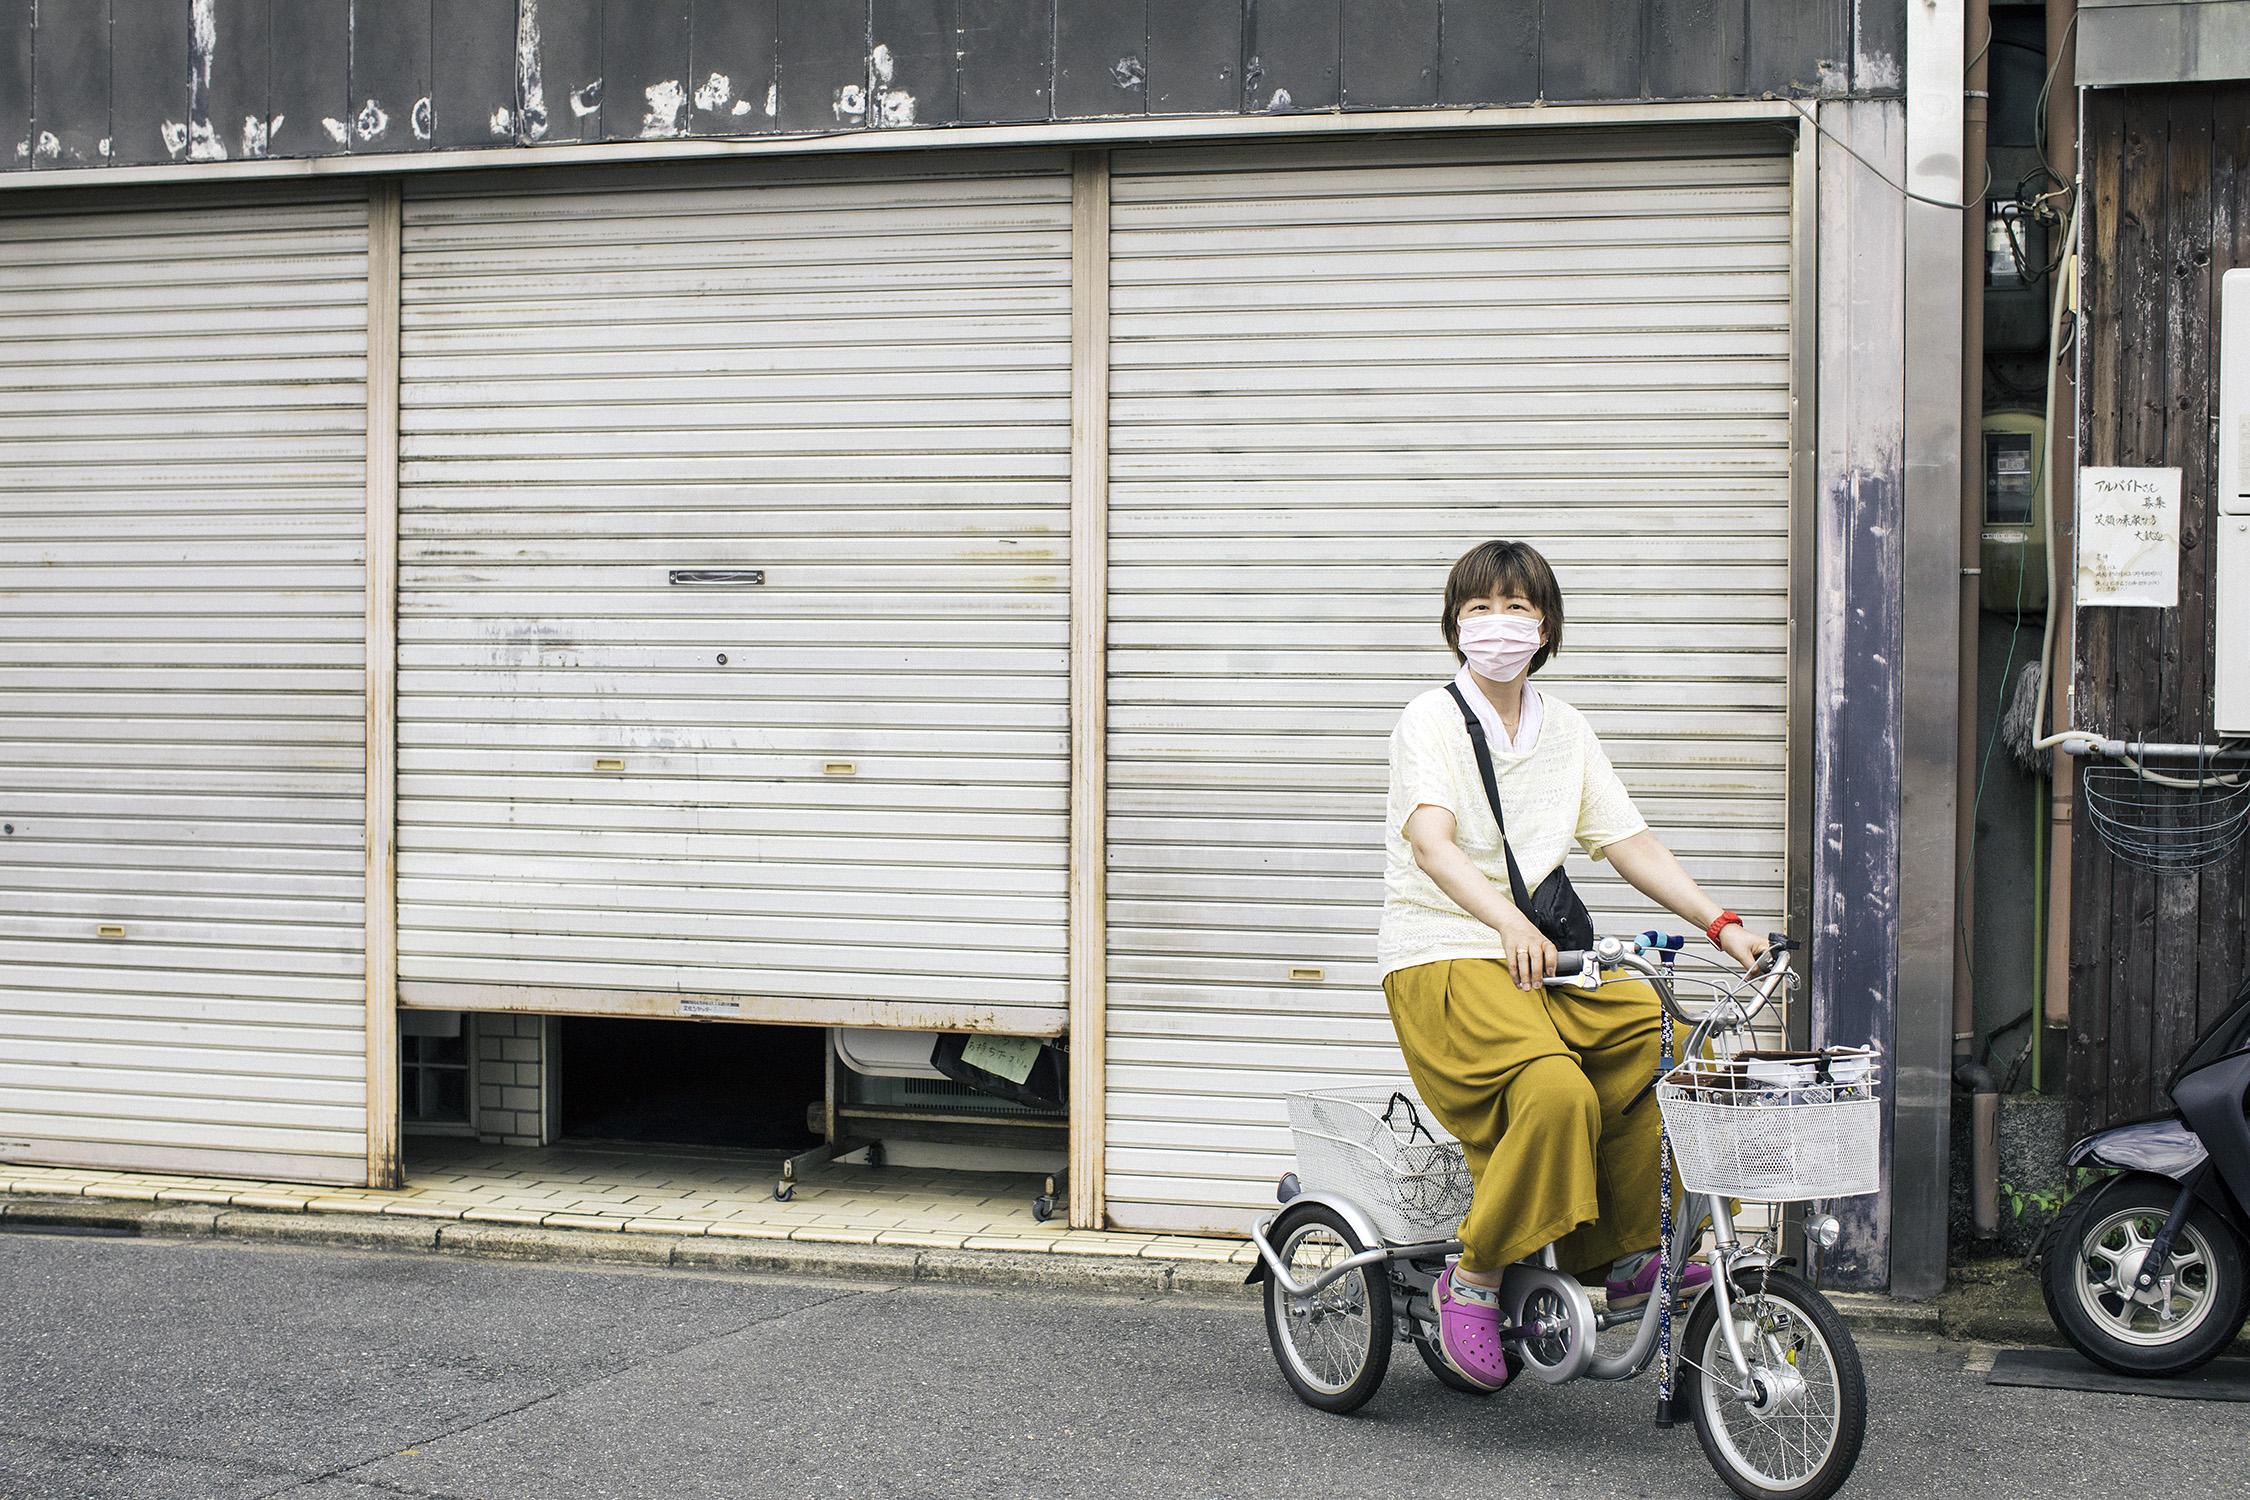 travel-japan-kyoto-washington-dc-malek-naz-photography-bicycling.jpg